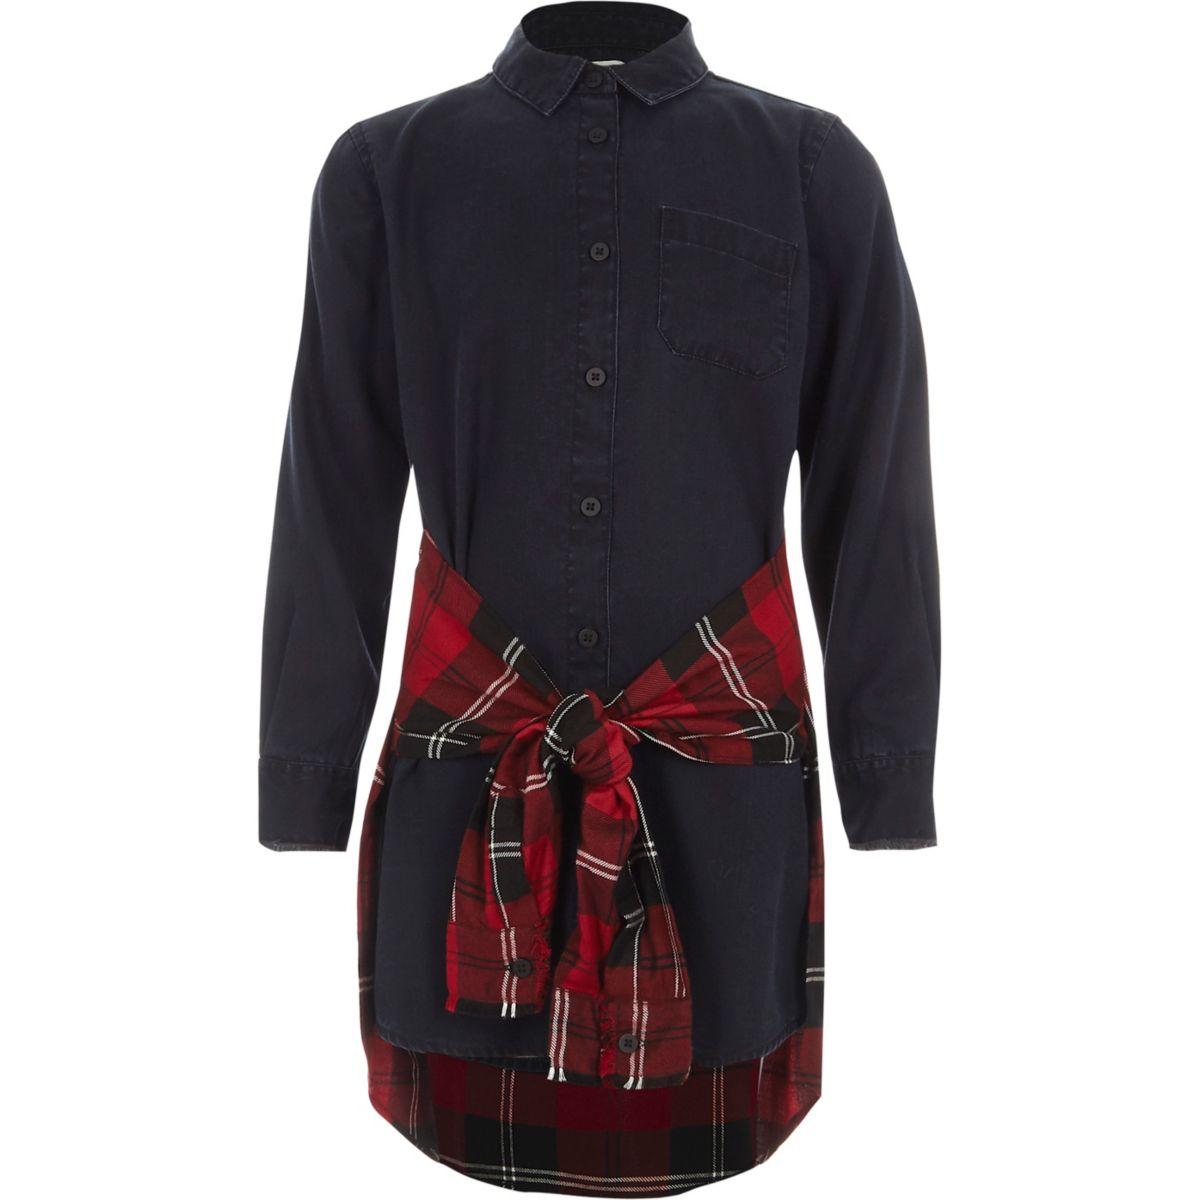 Girls dark denim red check shirt tie dress